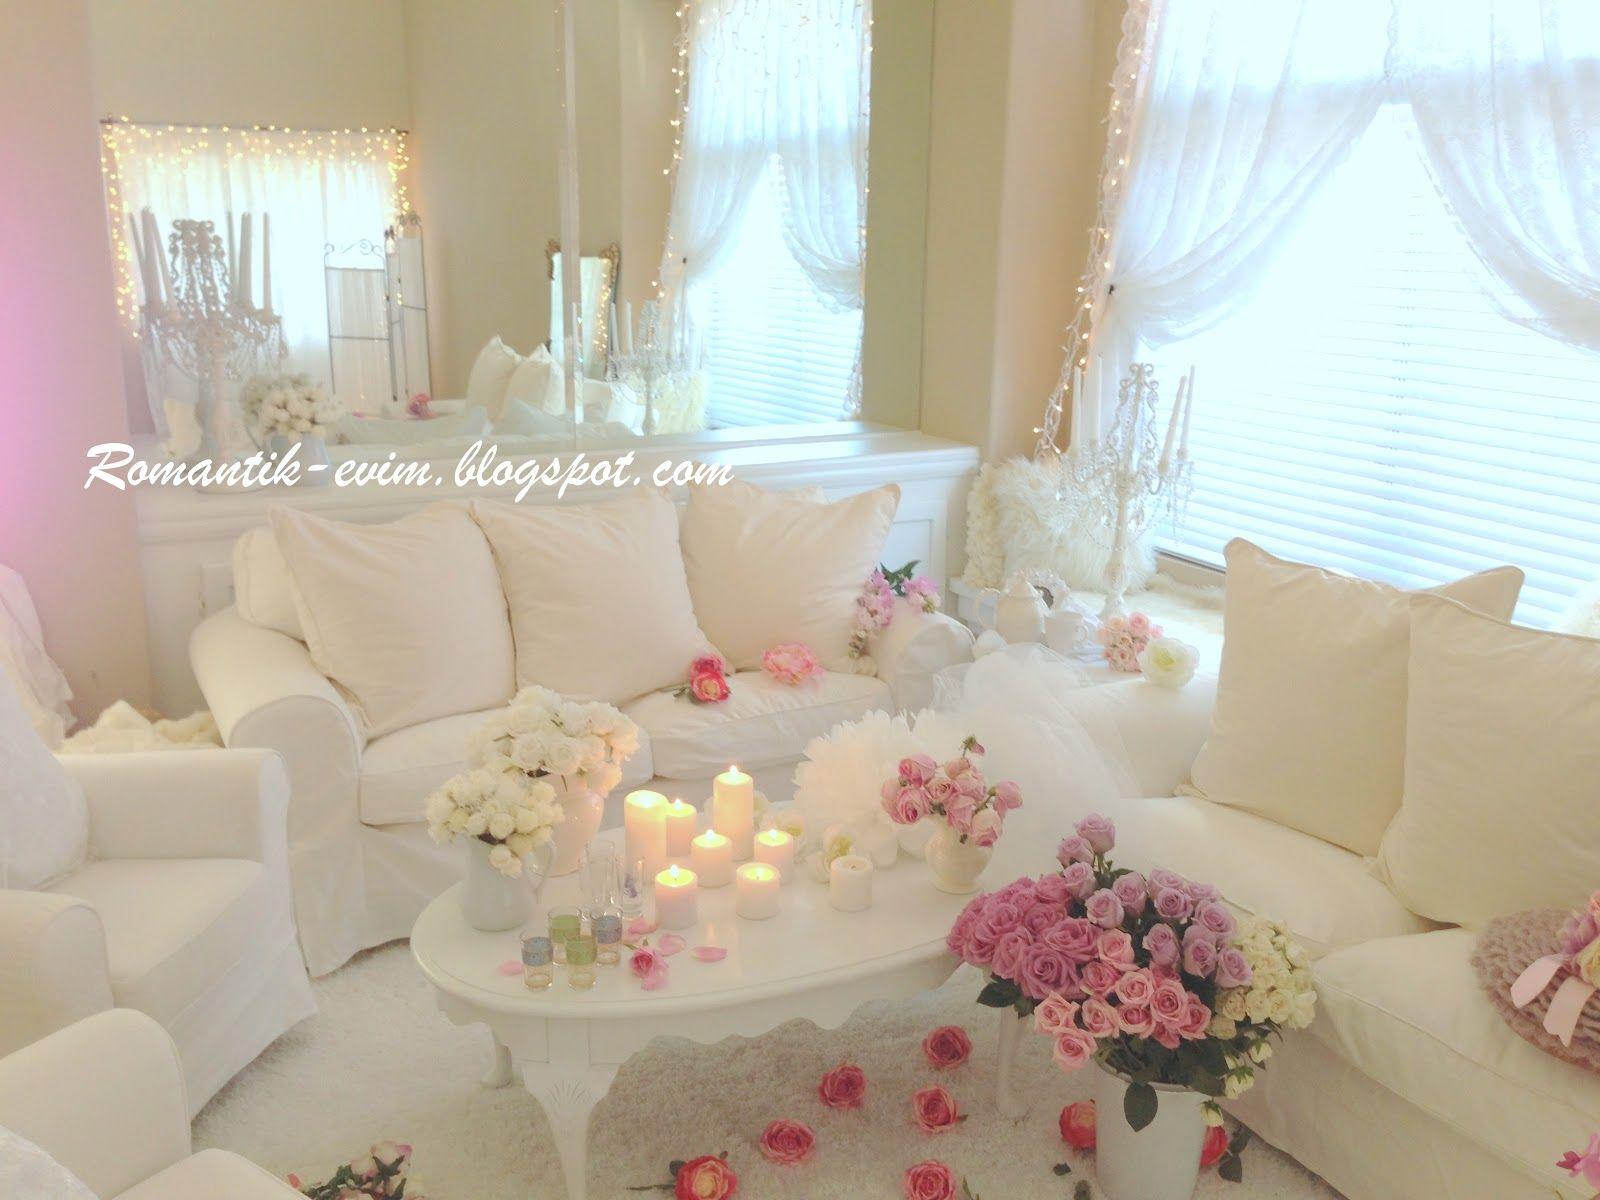 Shabby Chic Romantic Home Decor My Shabby Chic Home Romantik Evim Shabby Chic